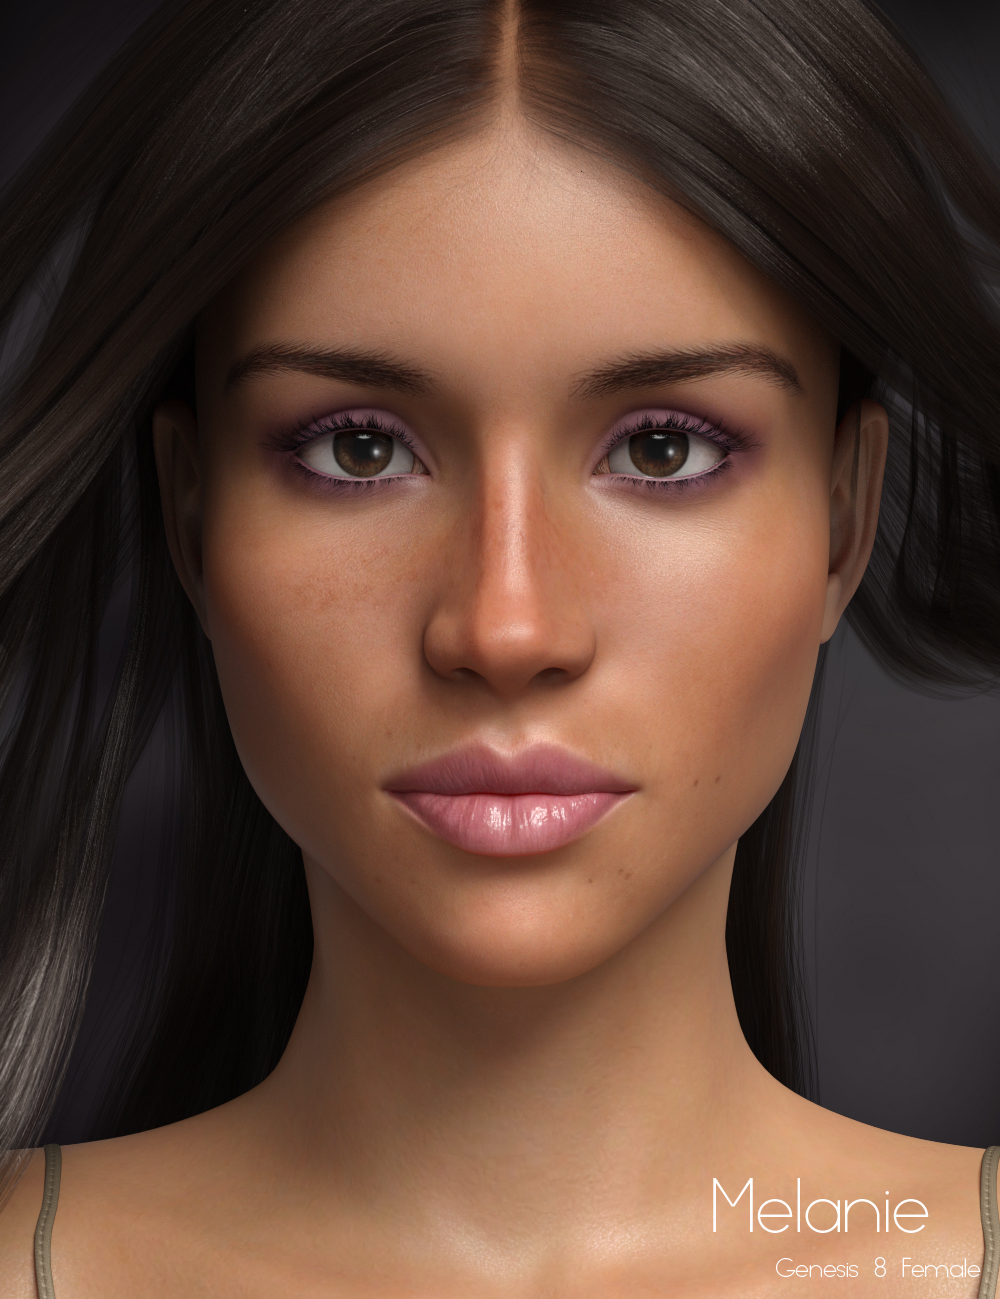 P3D Melanie HD for Genesis 8 Female by: P3Design, 3D Models by Daz 3D